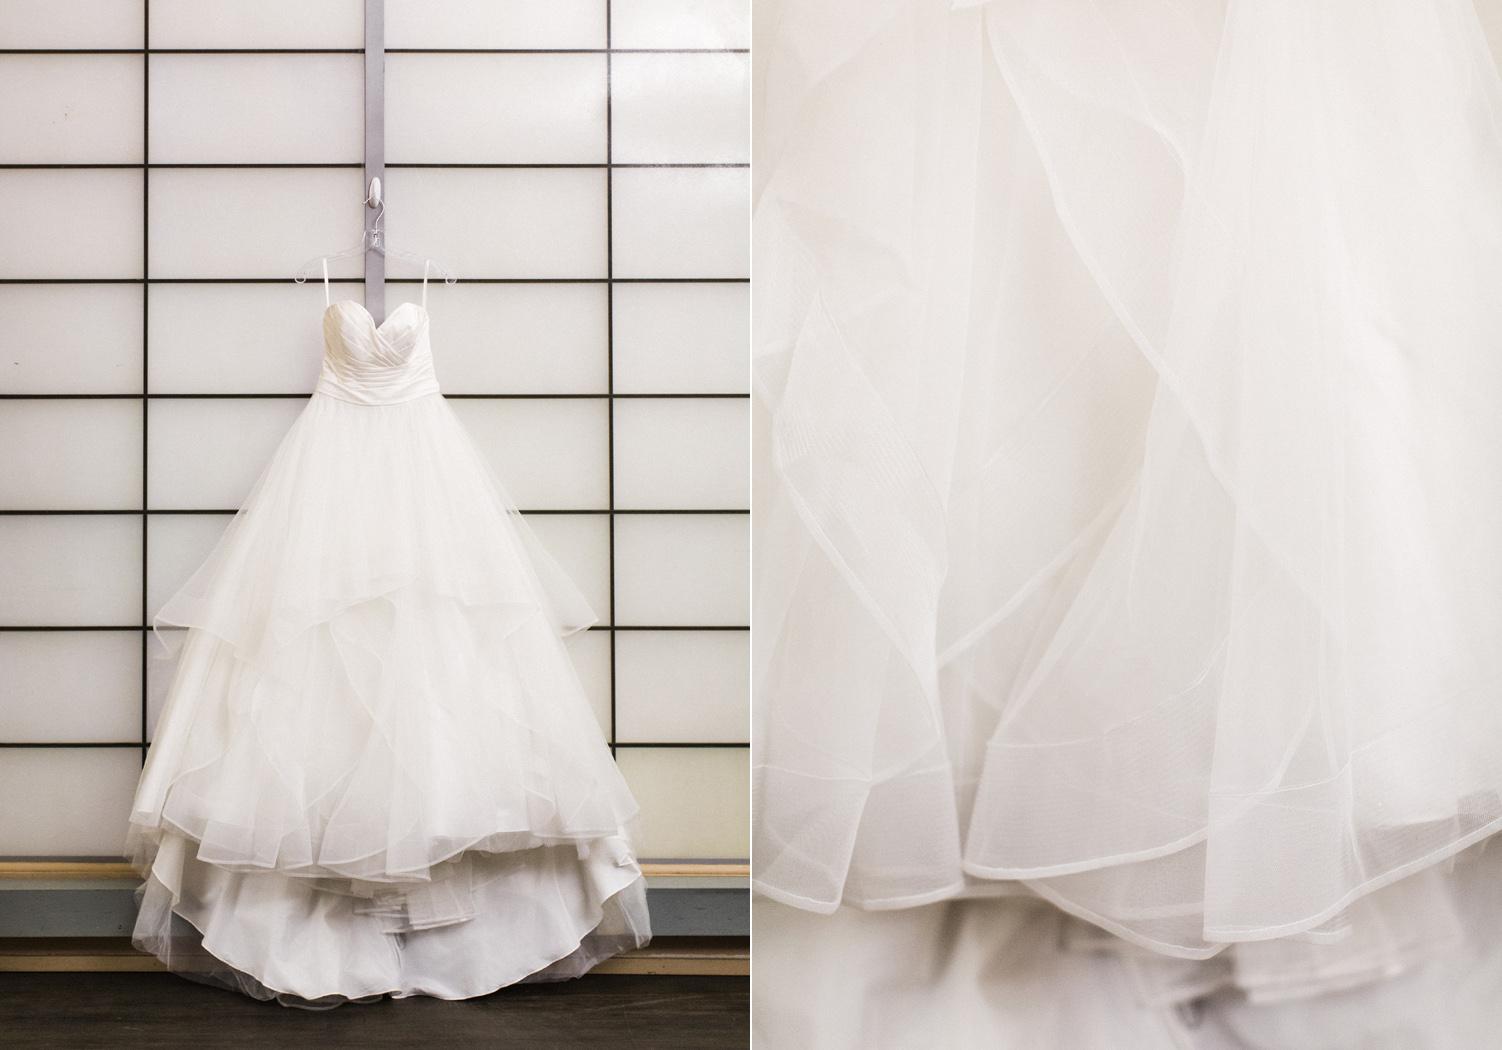 Seattle Wedding Photography Ballgown Wedding Dress at the Pickering Barn.jpg